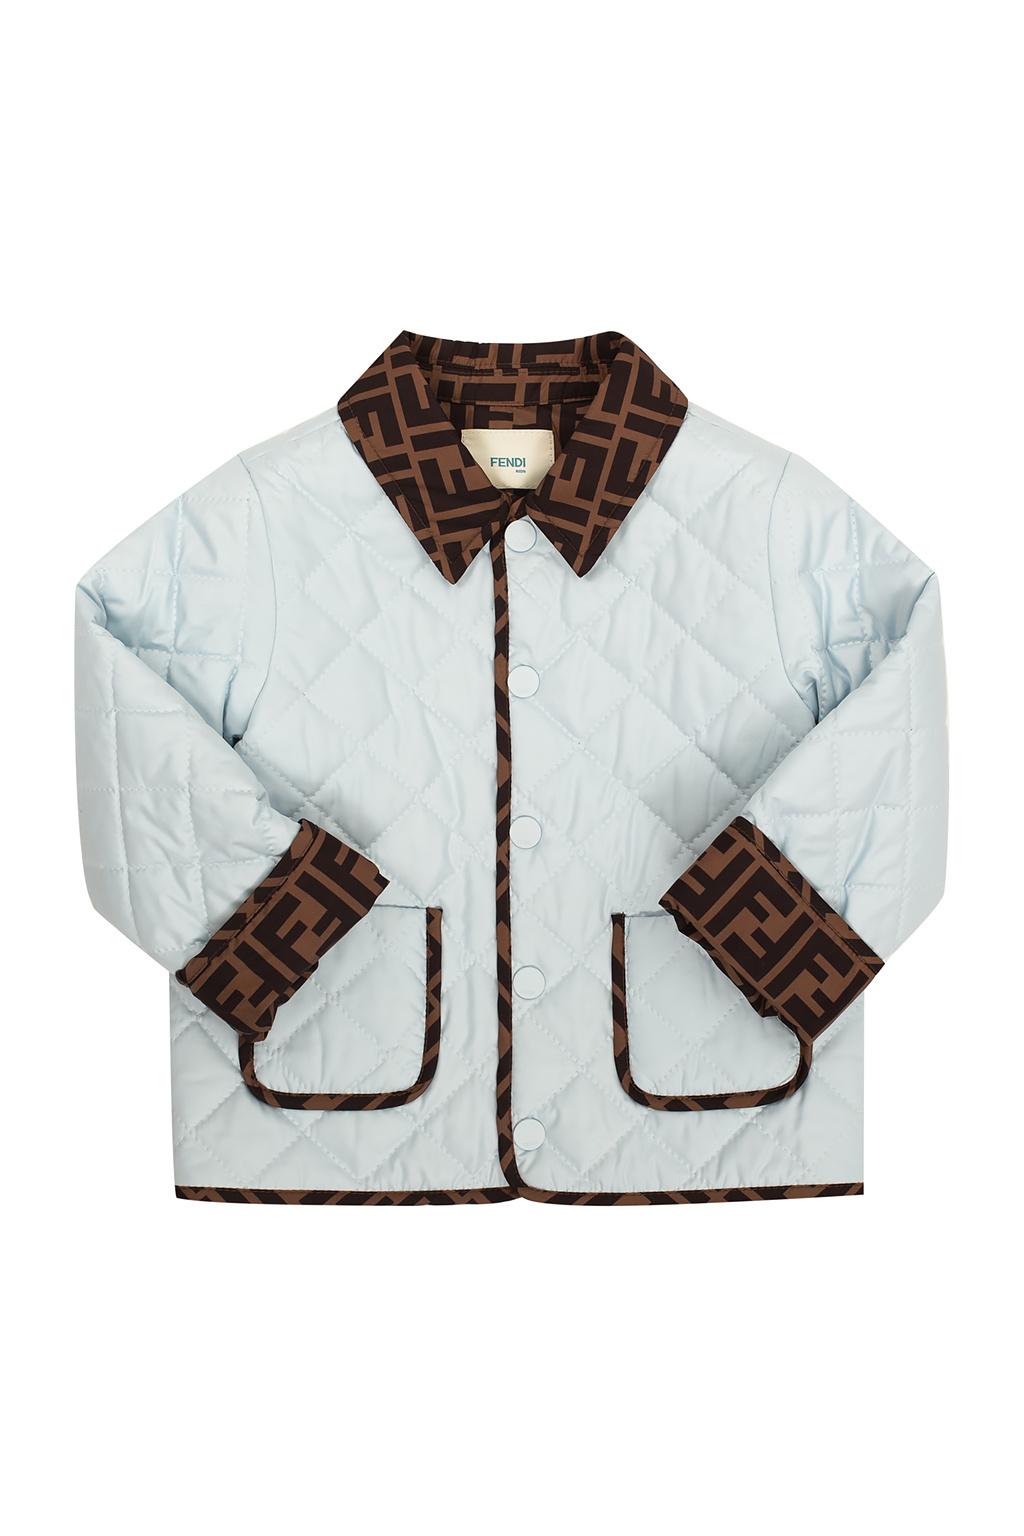 Fendi Kids Quilted jacket